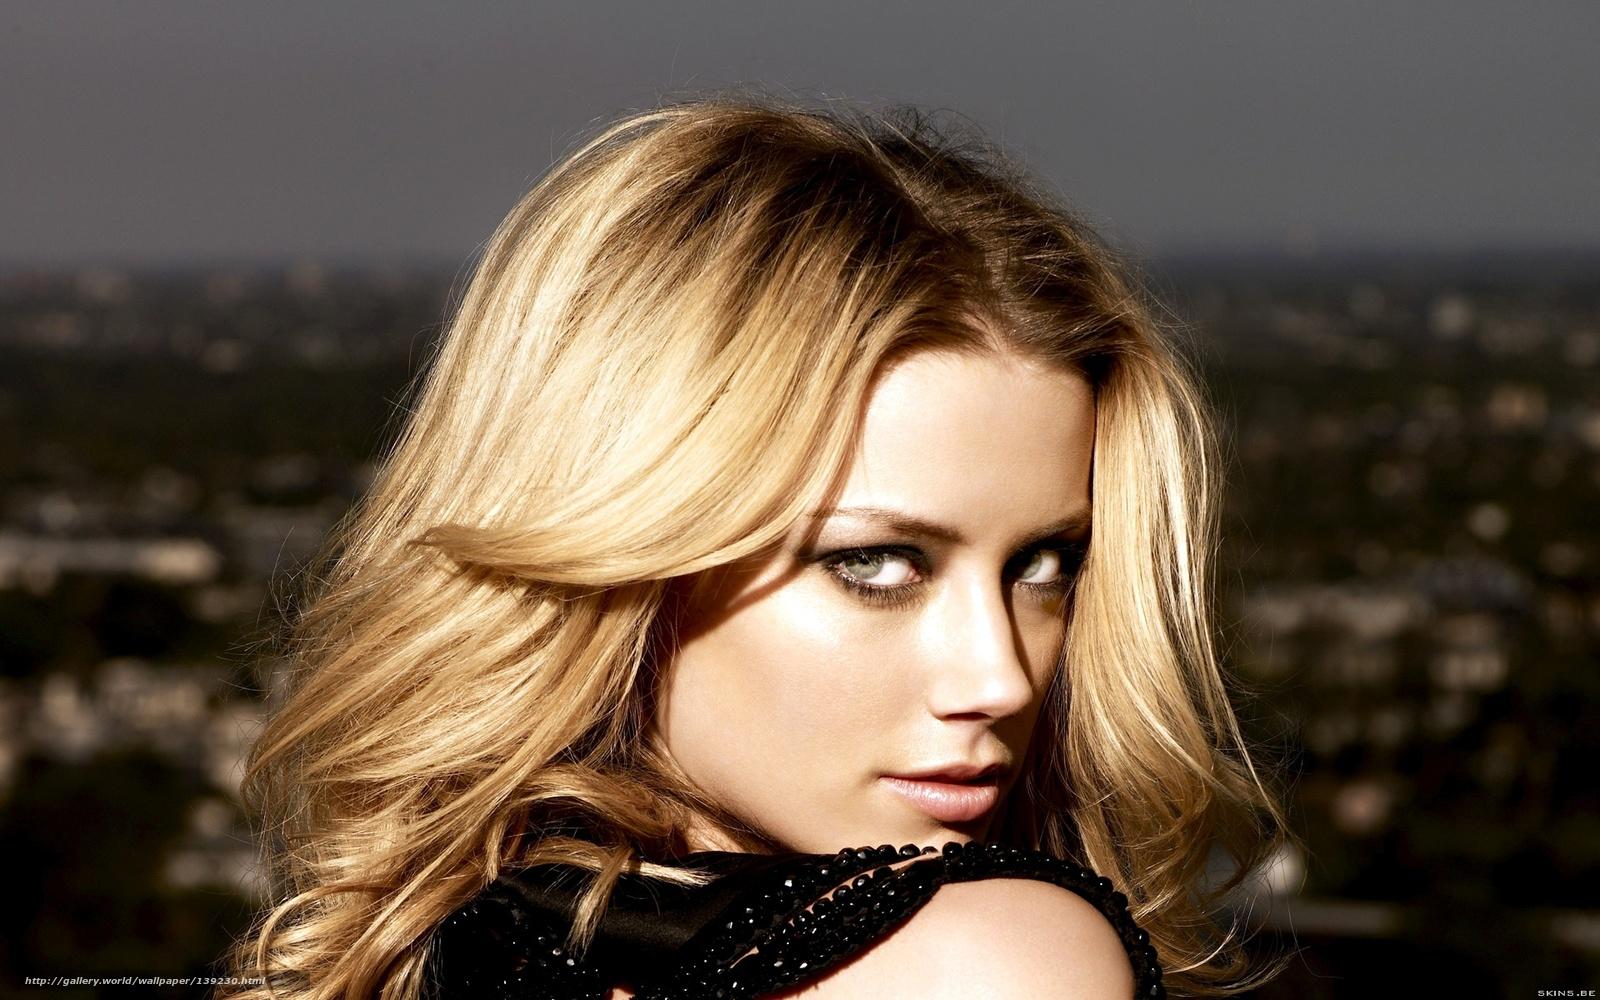 Amber Heard #398848 Amber Heard